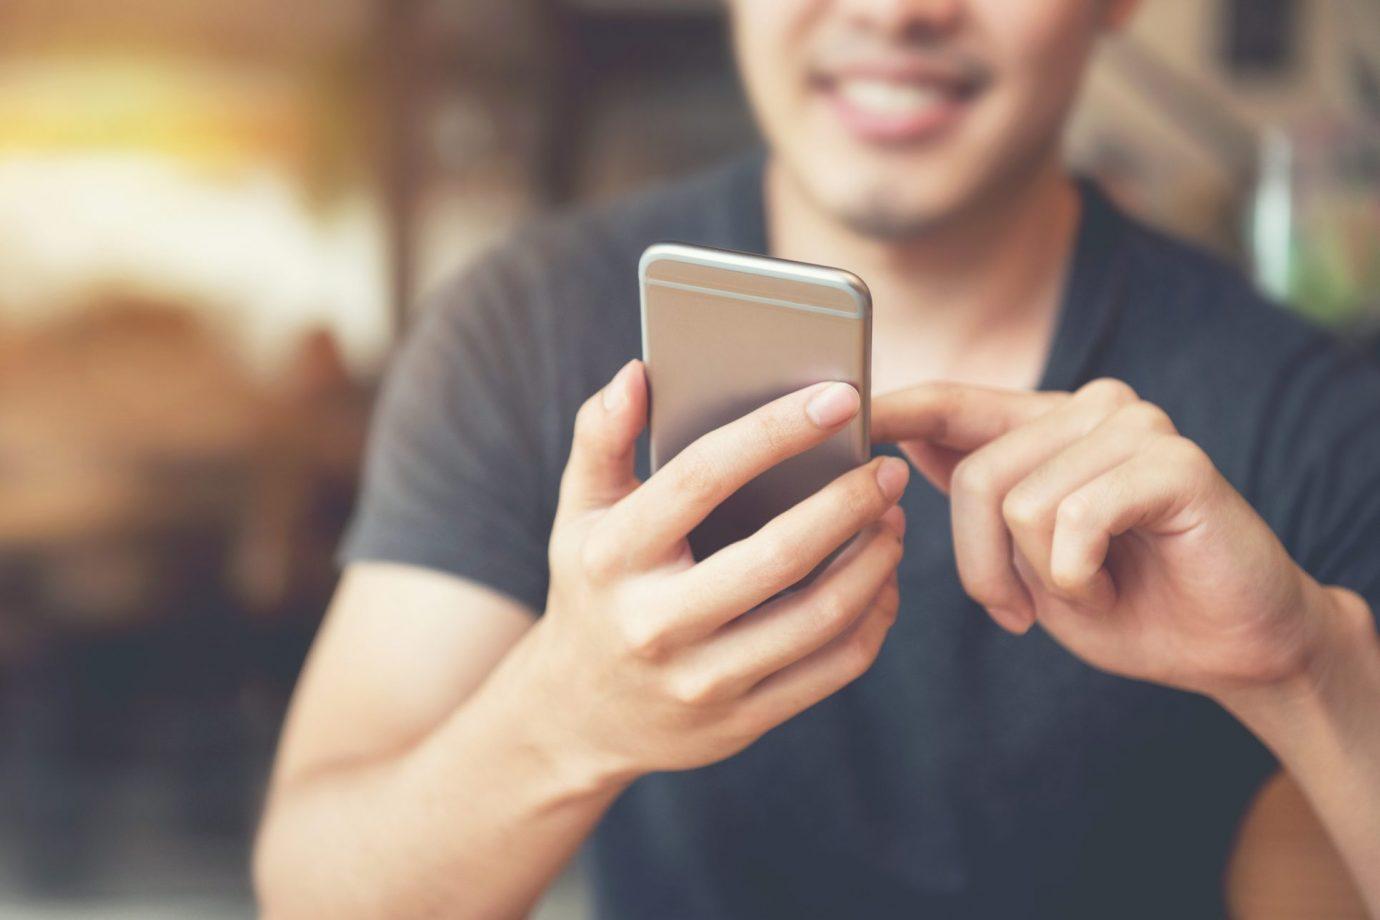 En MobiDoc Reparamos Tu iPhone Frente A Vos